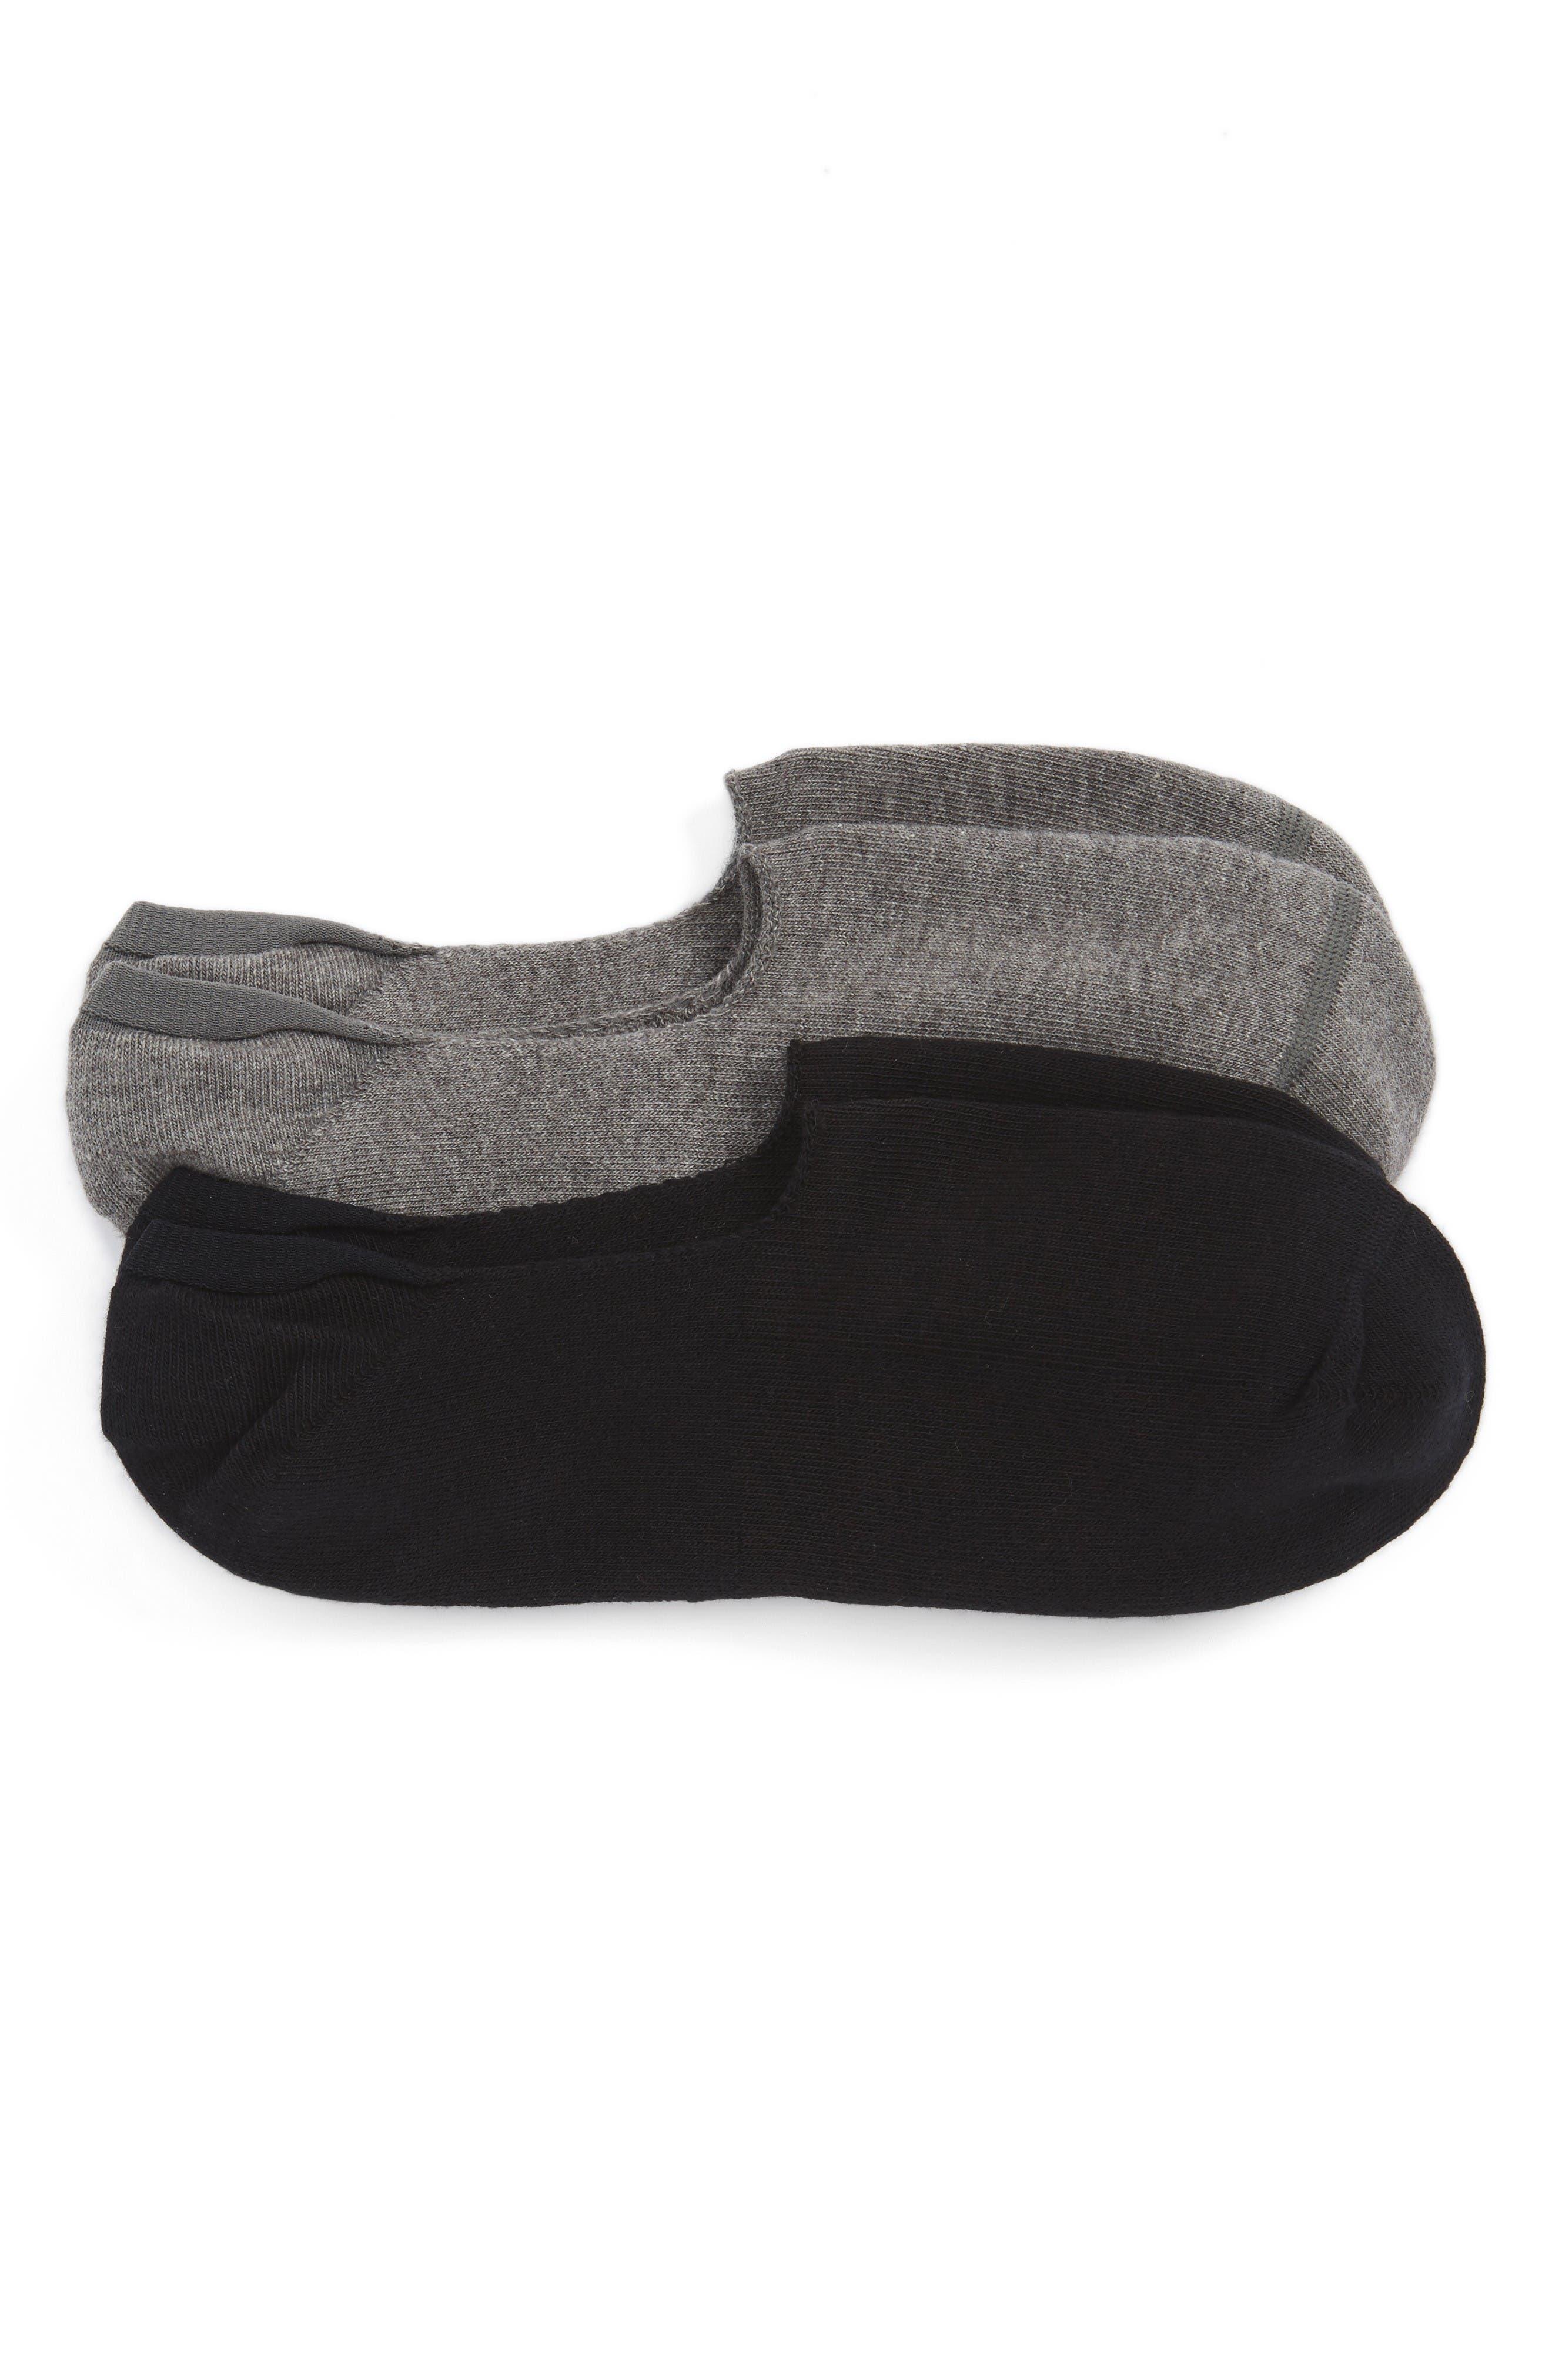 2-Pack Everyday Liner Socks,                             Main thumbnail 1, color,                             Black/ Grey